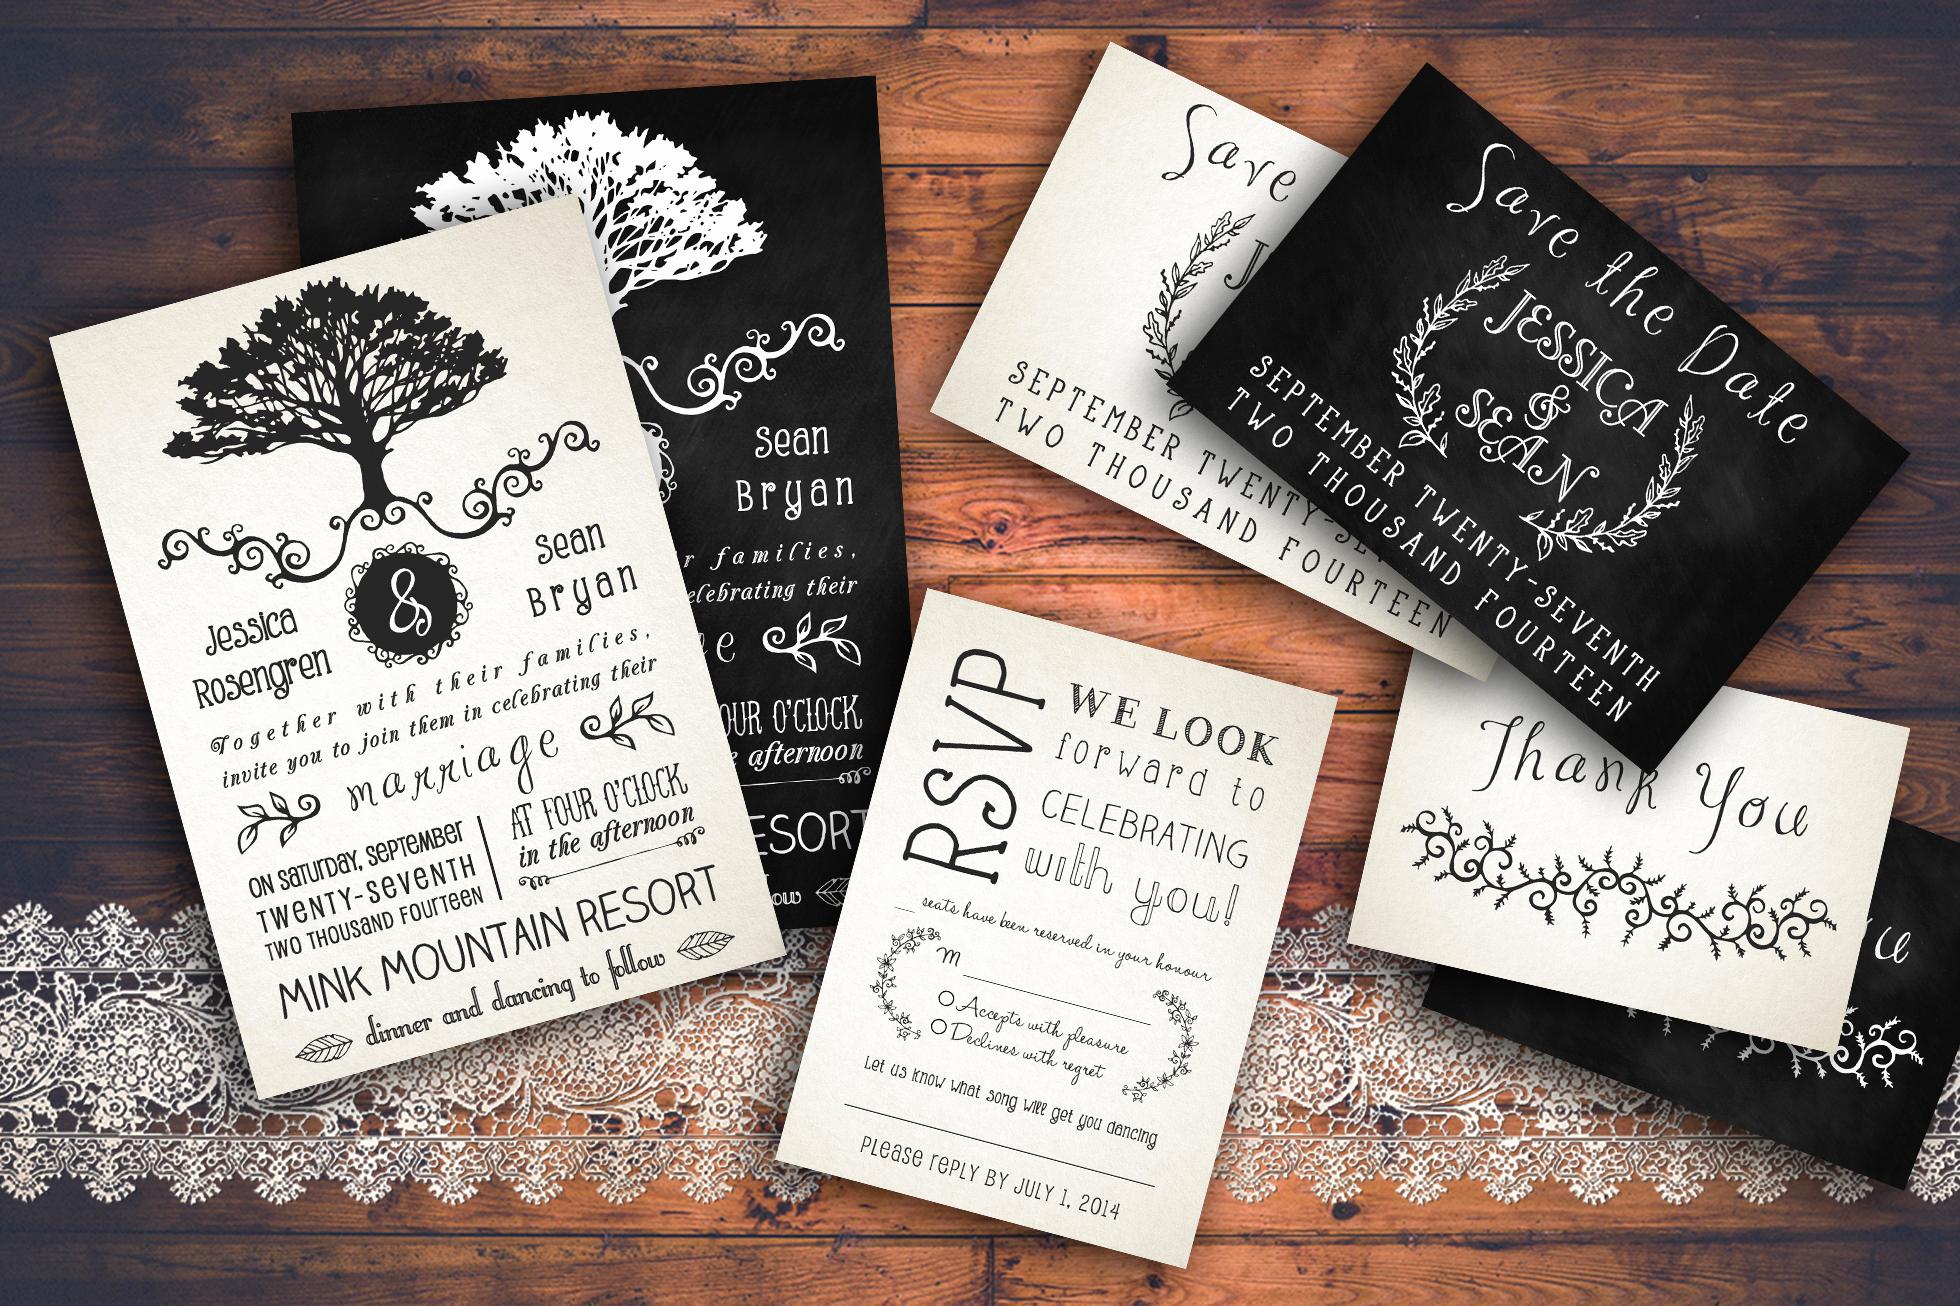 Free Rustic Wedding Invitation Templates Luxury Rustic Wedding Invitation Pack Invitation Templates On